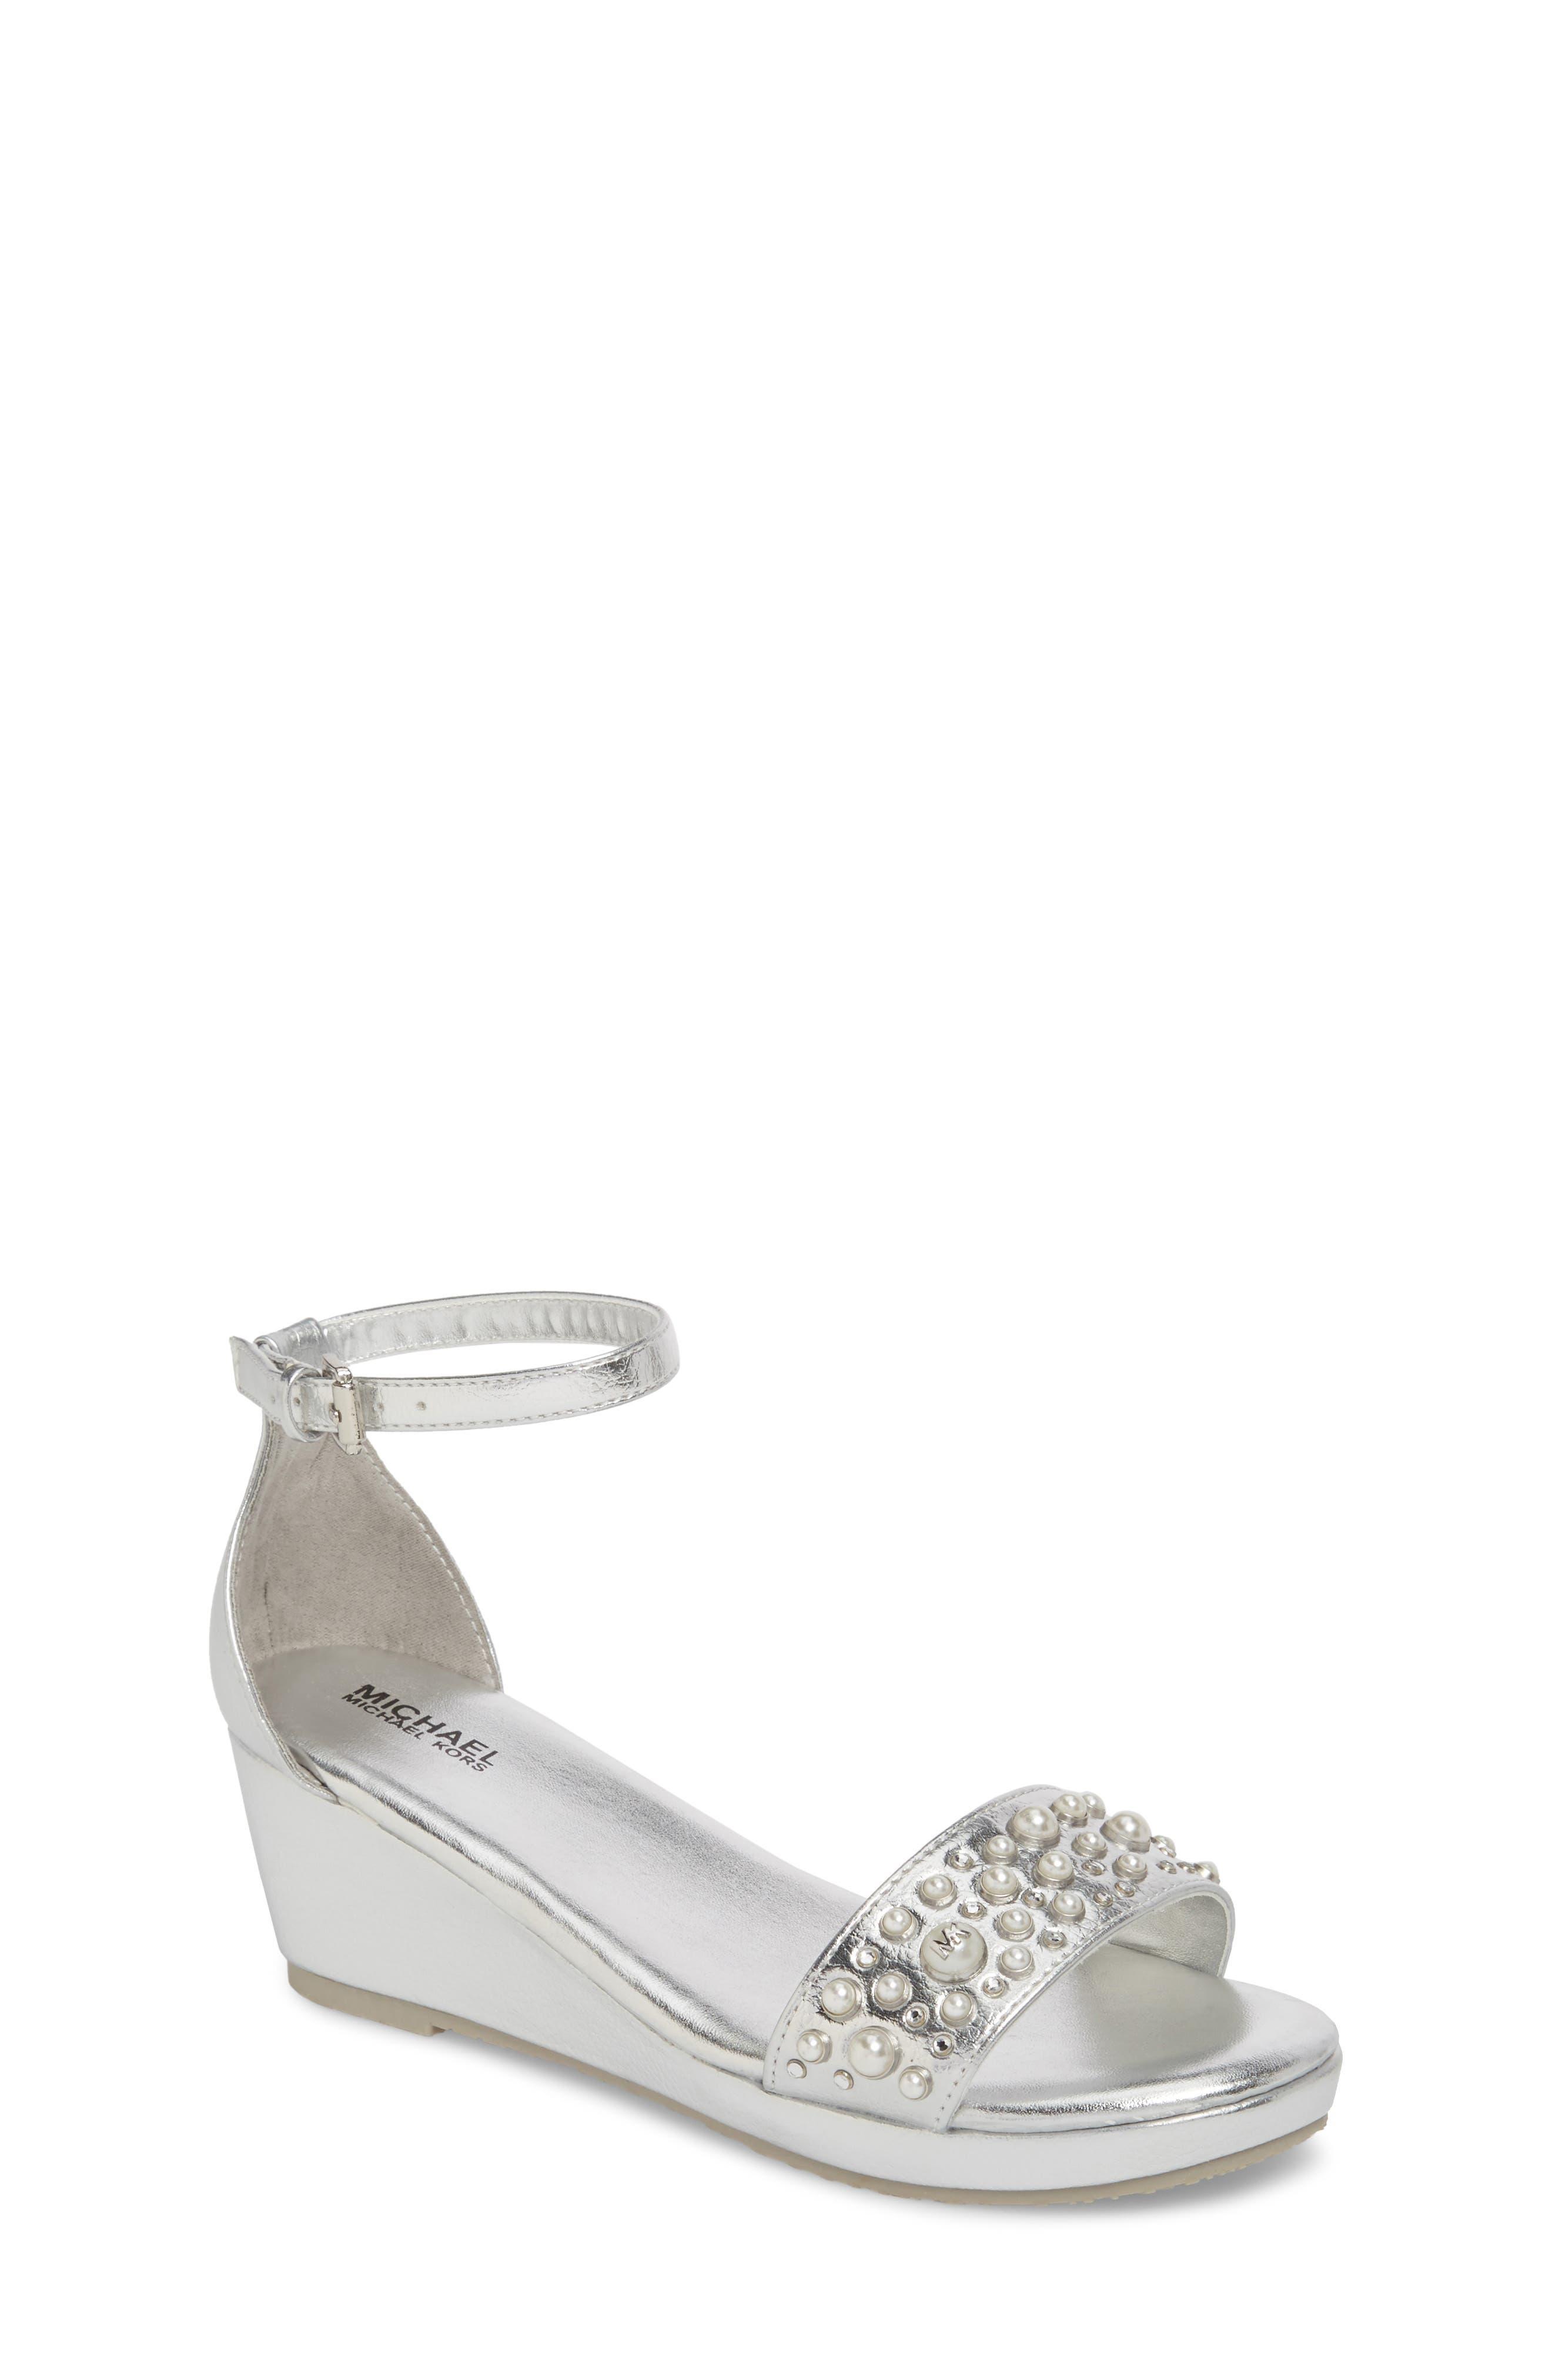 Cate Embellished Wedge Sandal,                         Main,                         color,